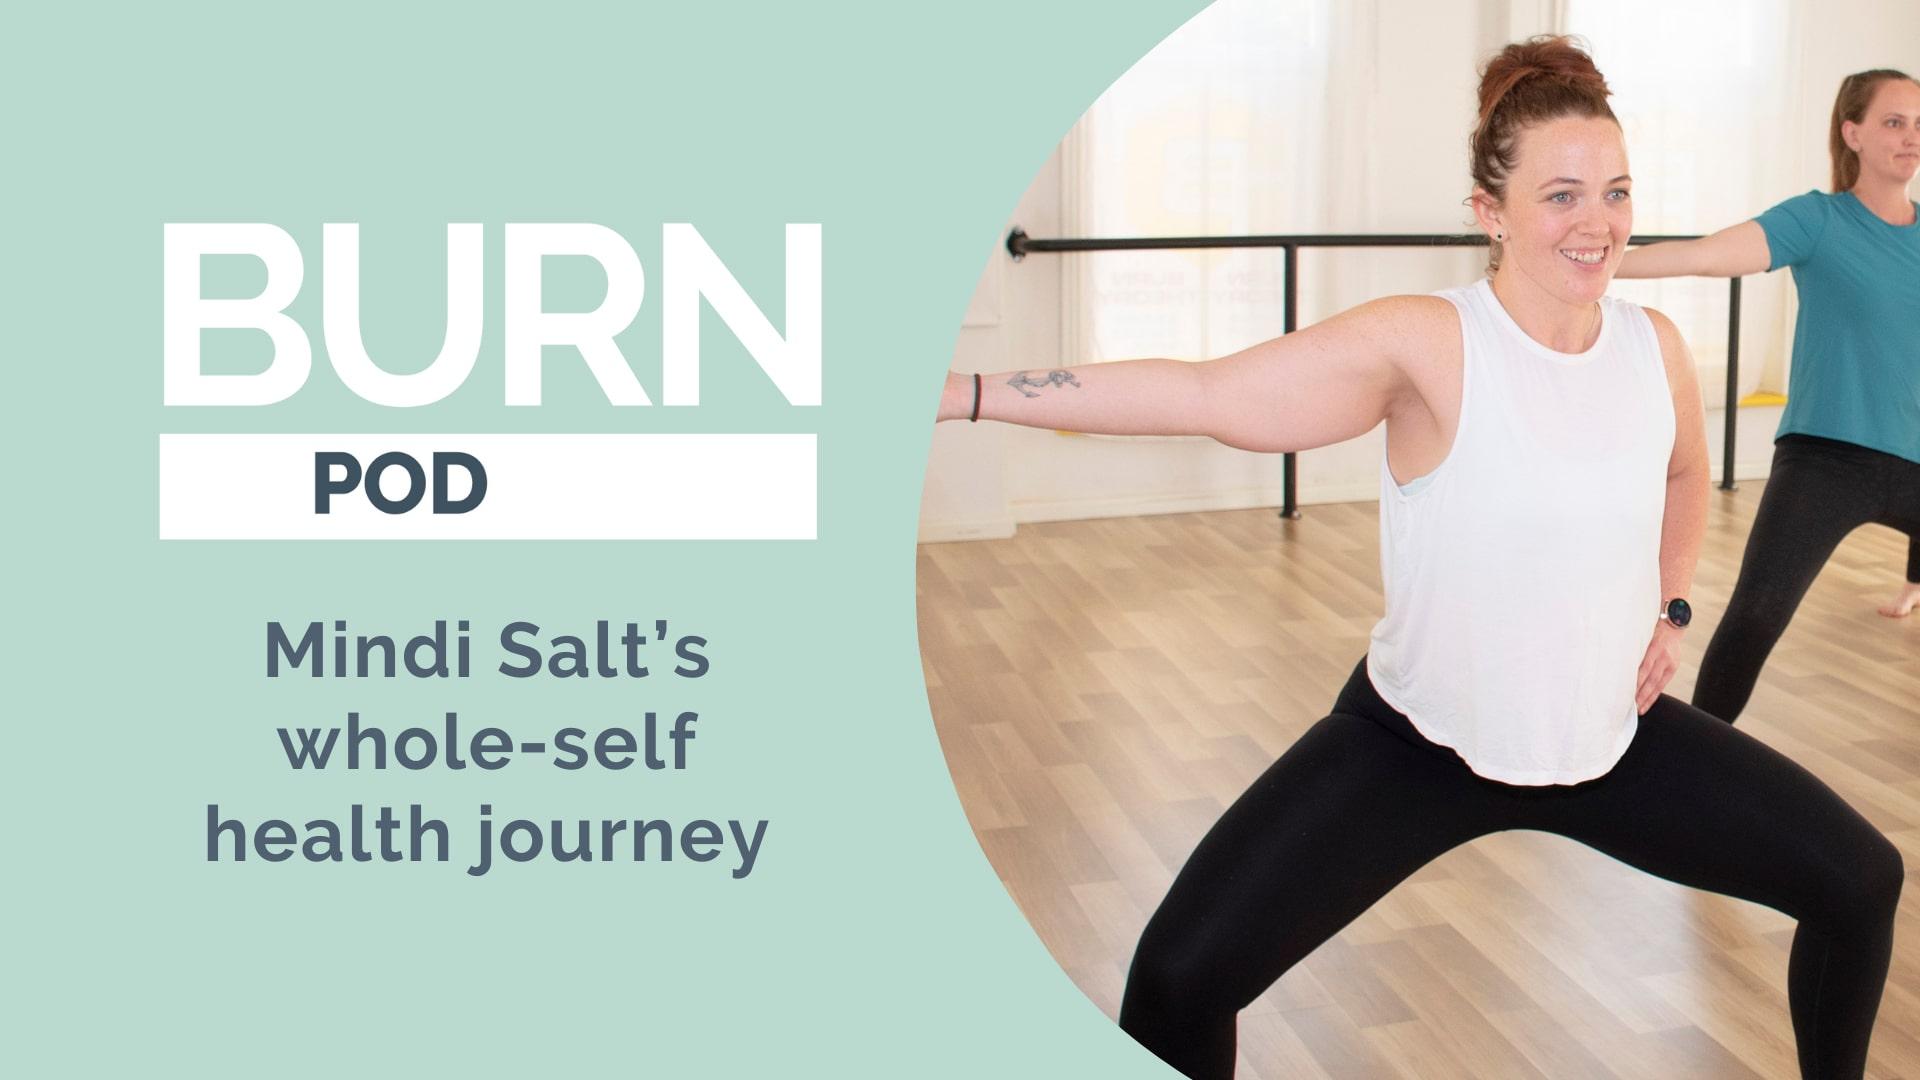 Mindi Salt's whole-self health journey